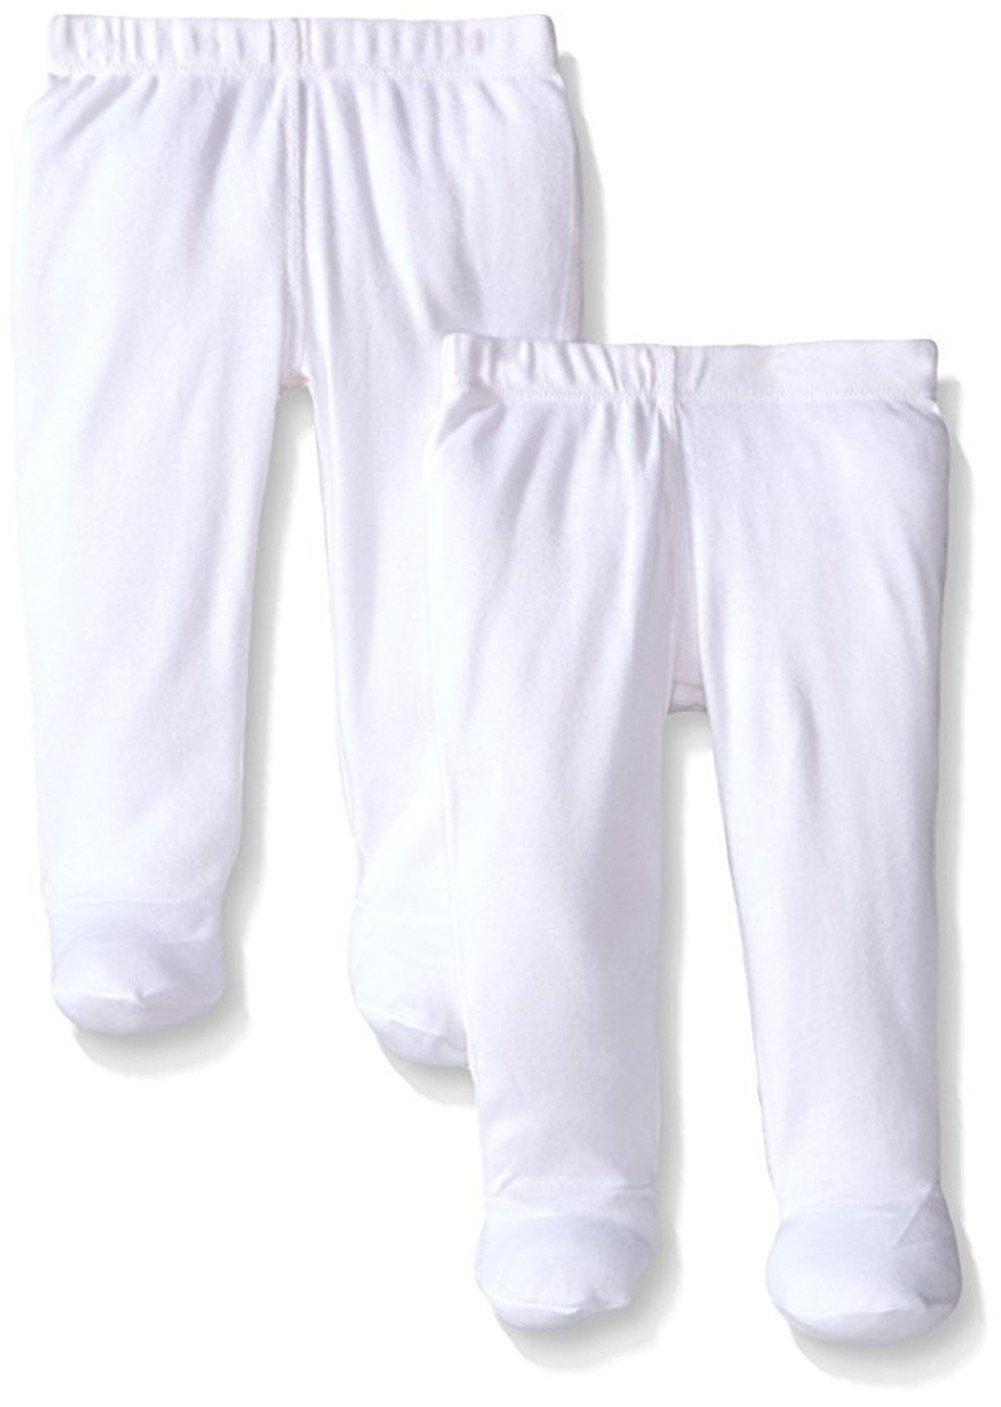 Banner Bonnie Unisex Baby 2 Pack 100% Cotton Footed Underwear Pants Infants Ultra Soft Cotton Footie